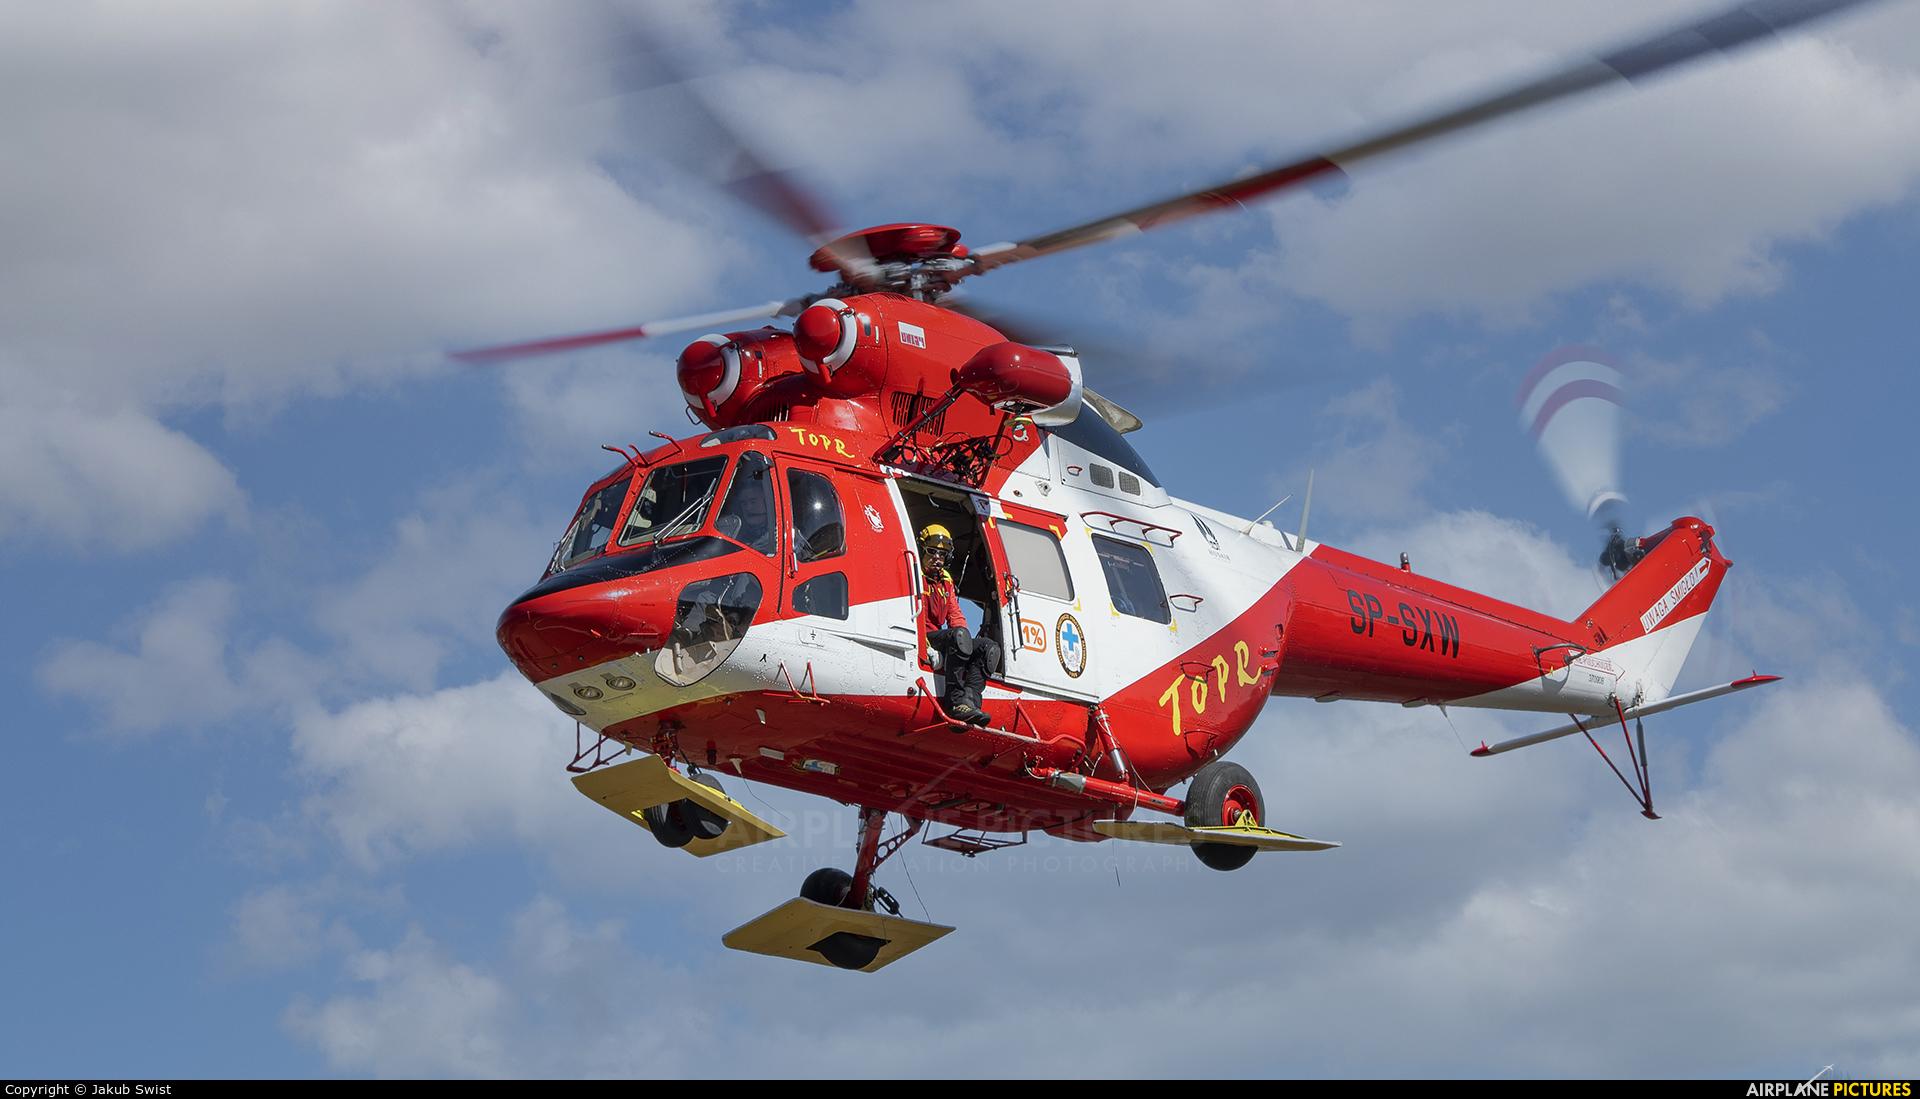 Tatra Mountains Rescue (TOPR) SP-SXW aircraft at Zakopane